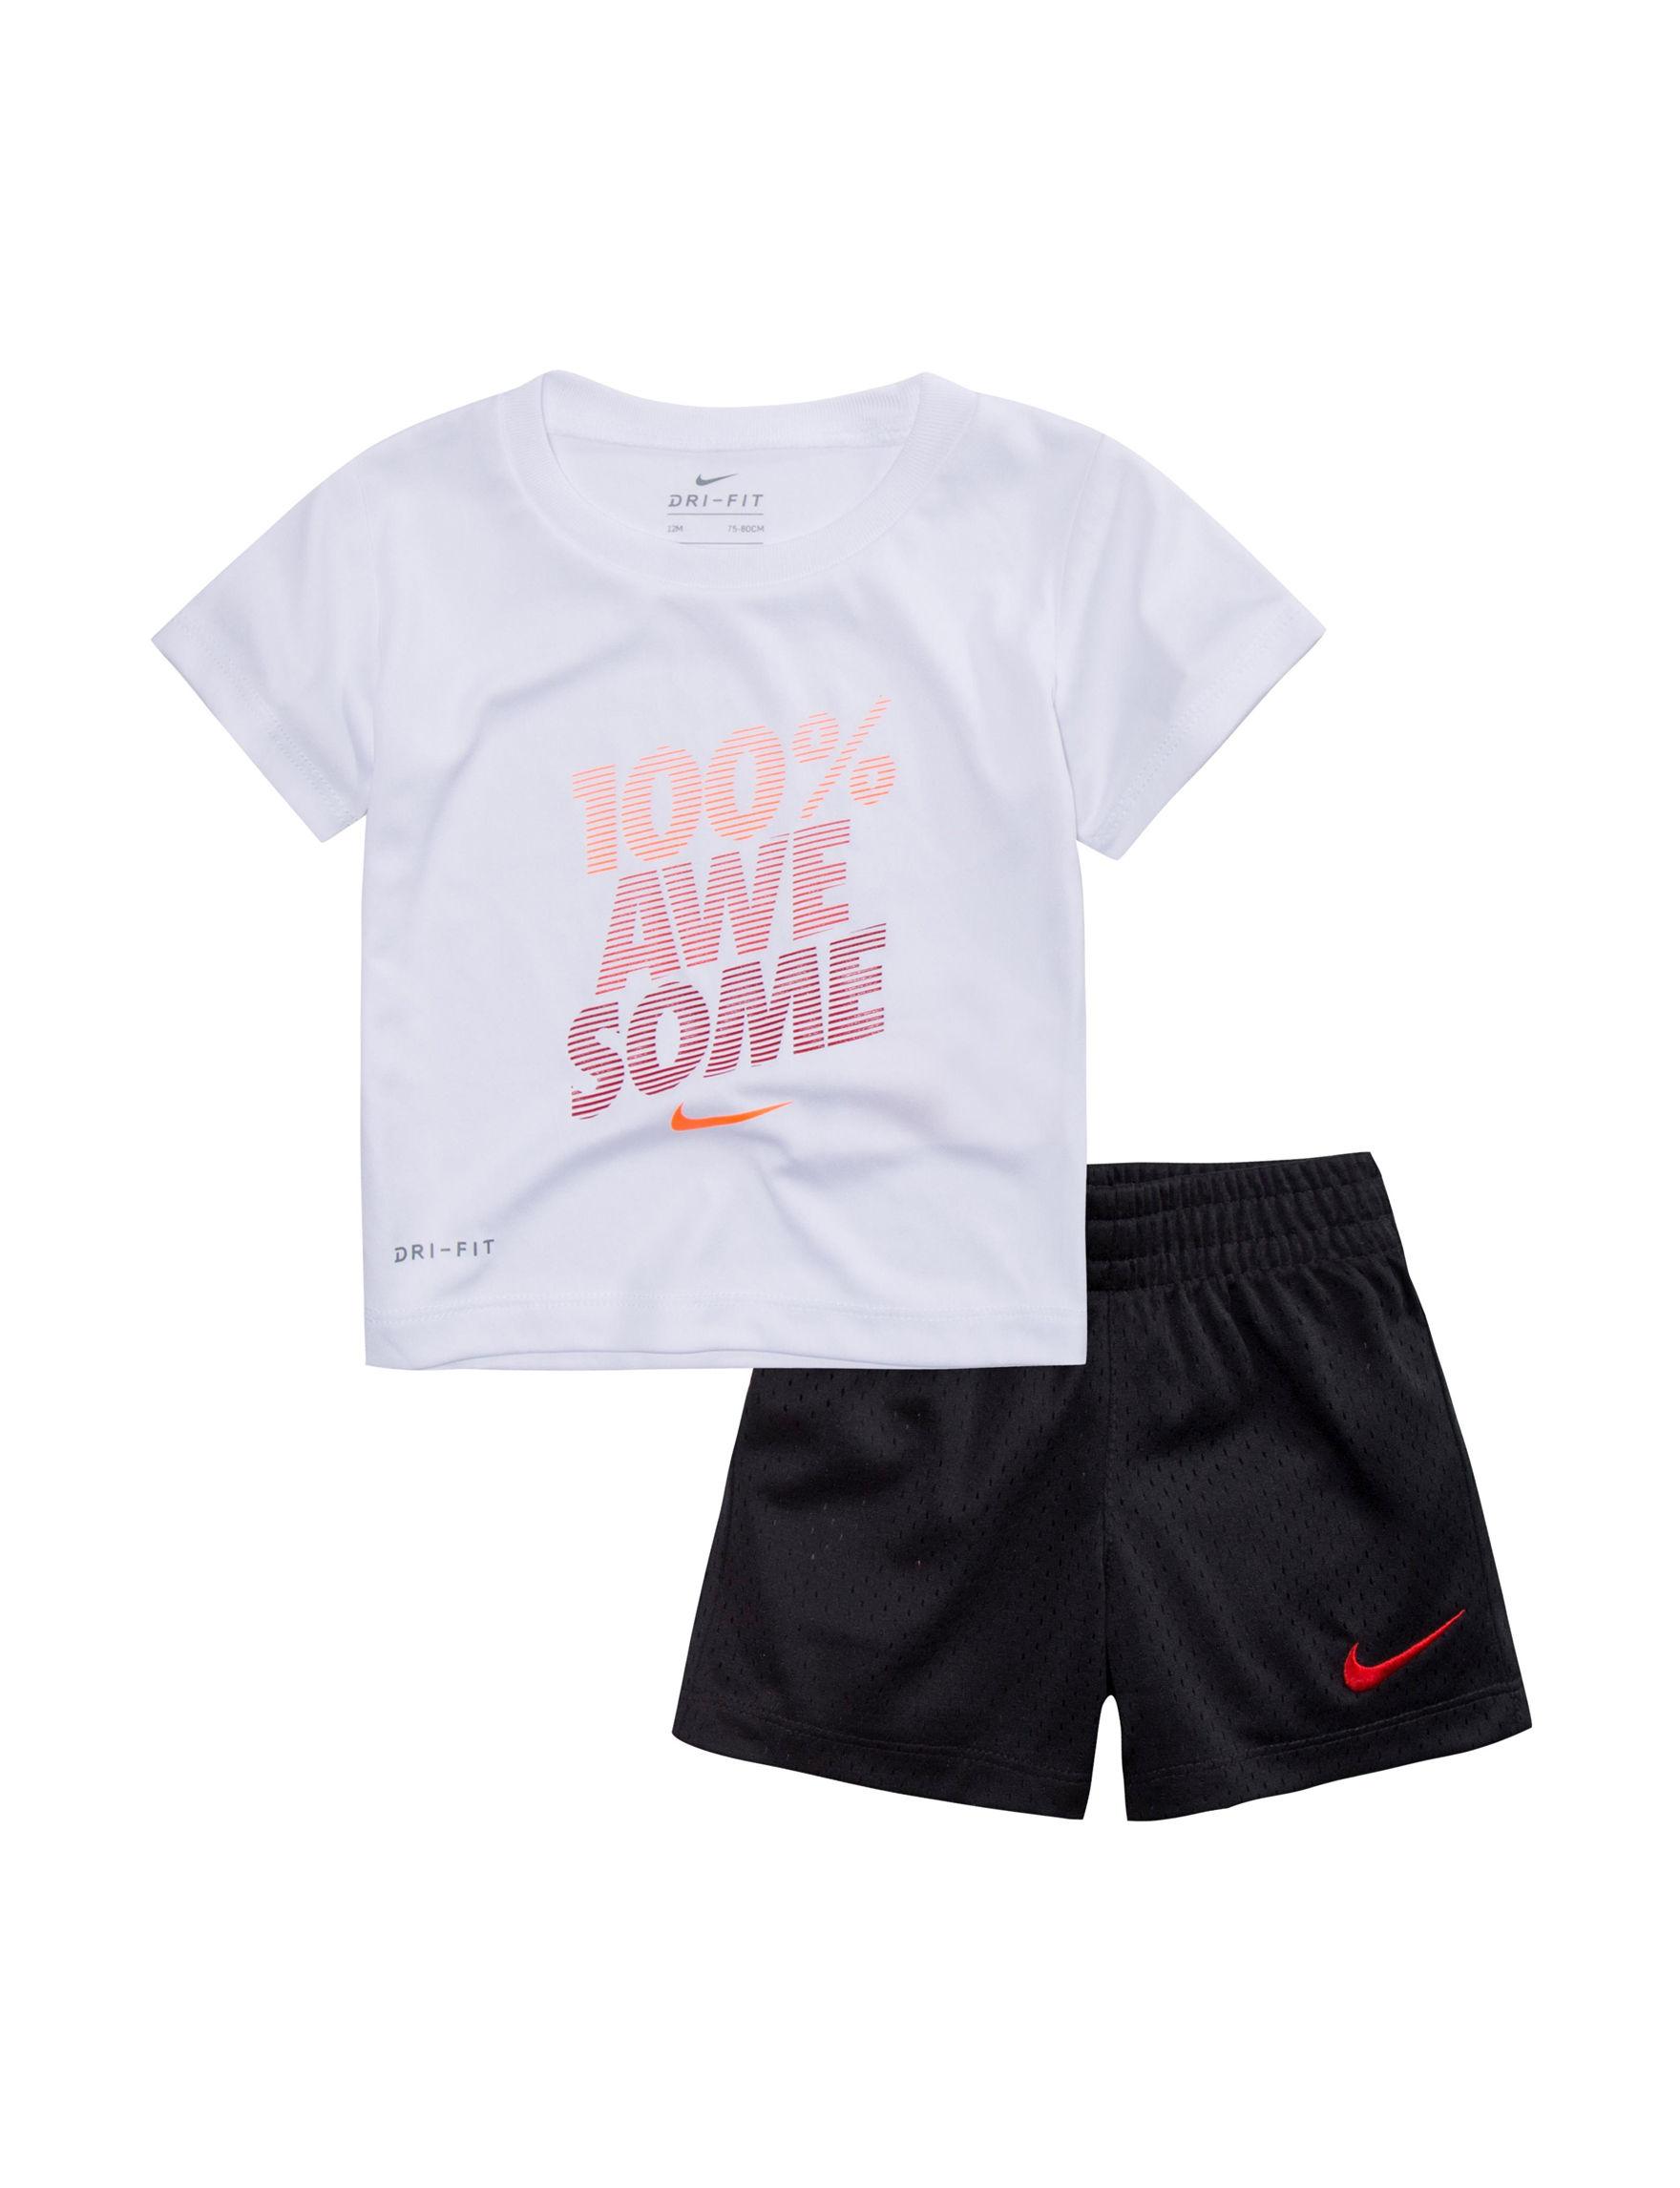 Nike White / Black